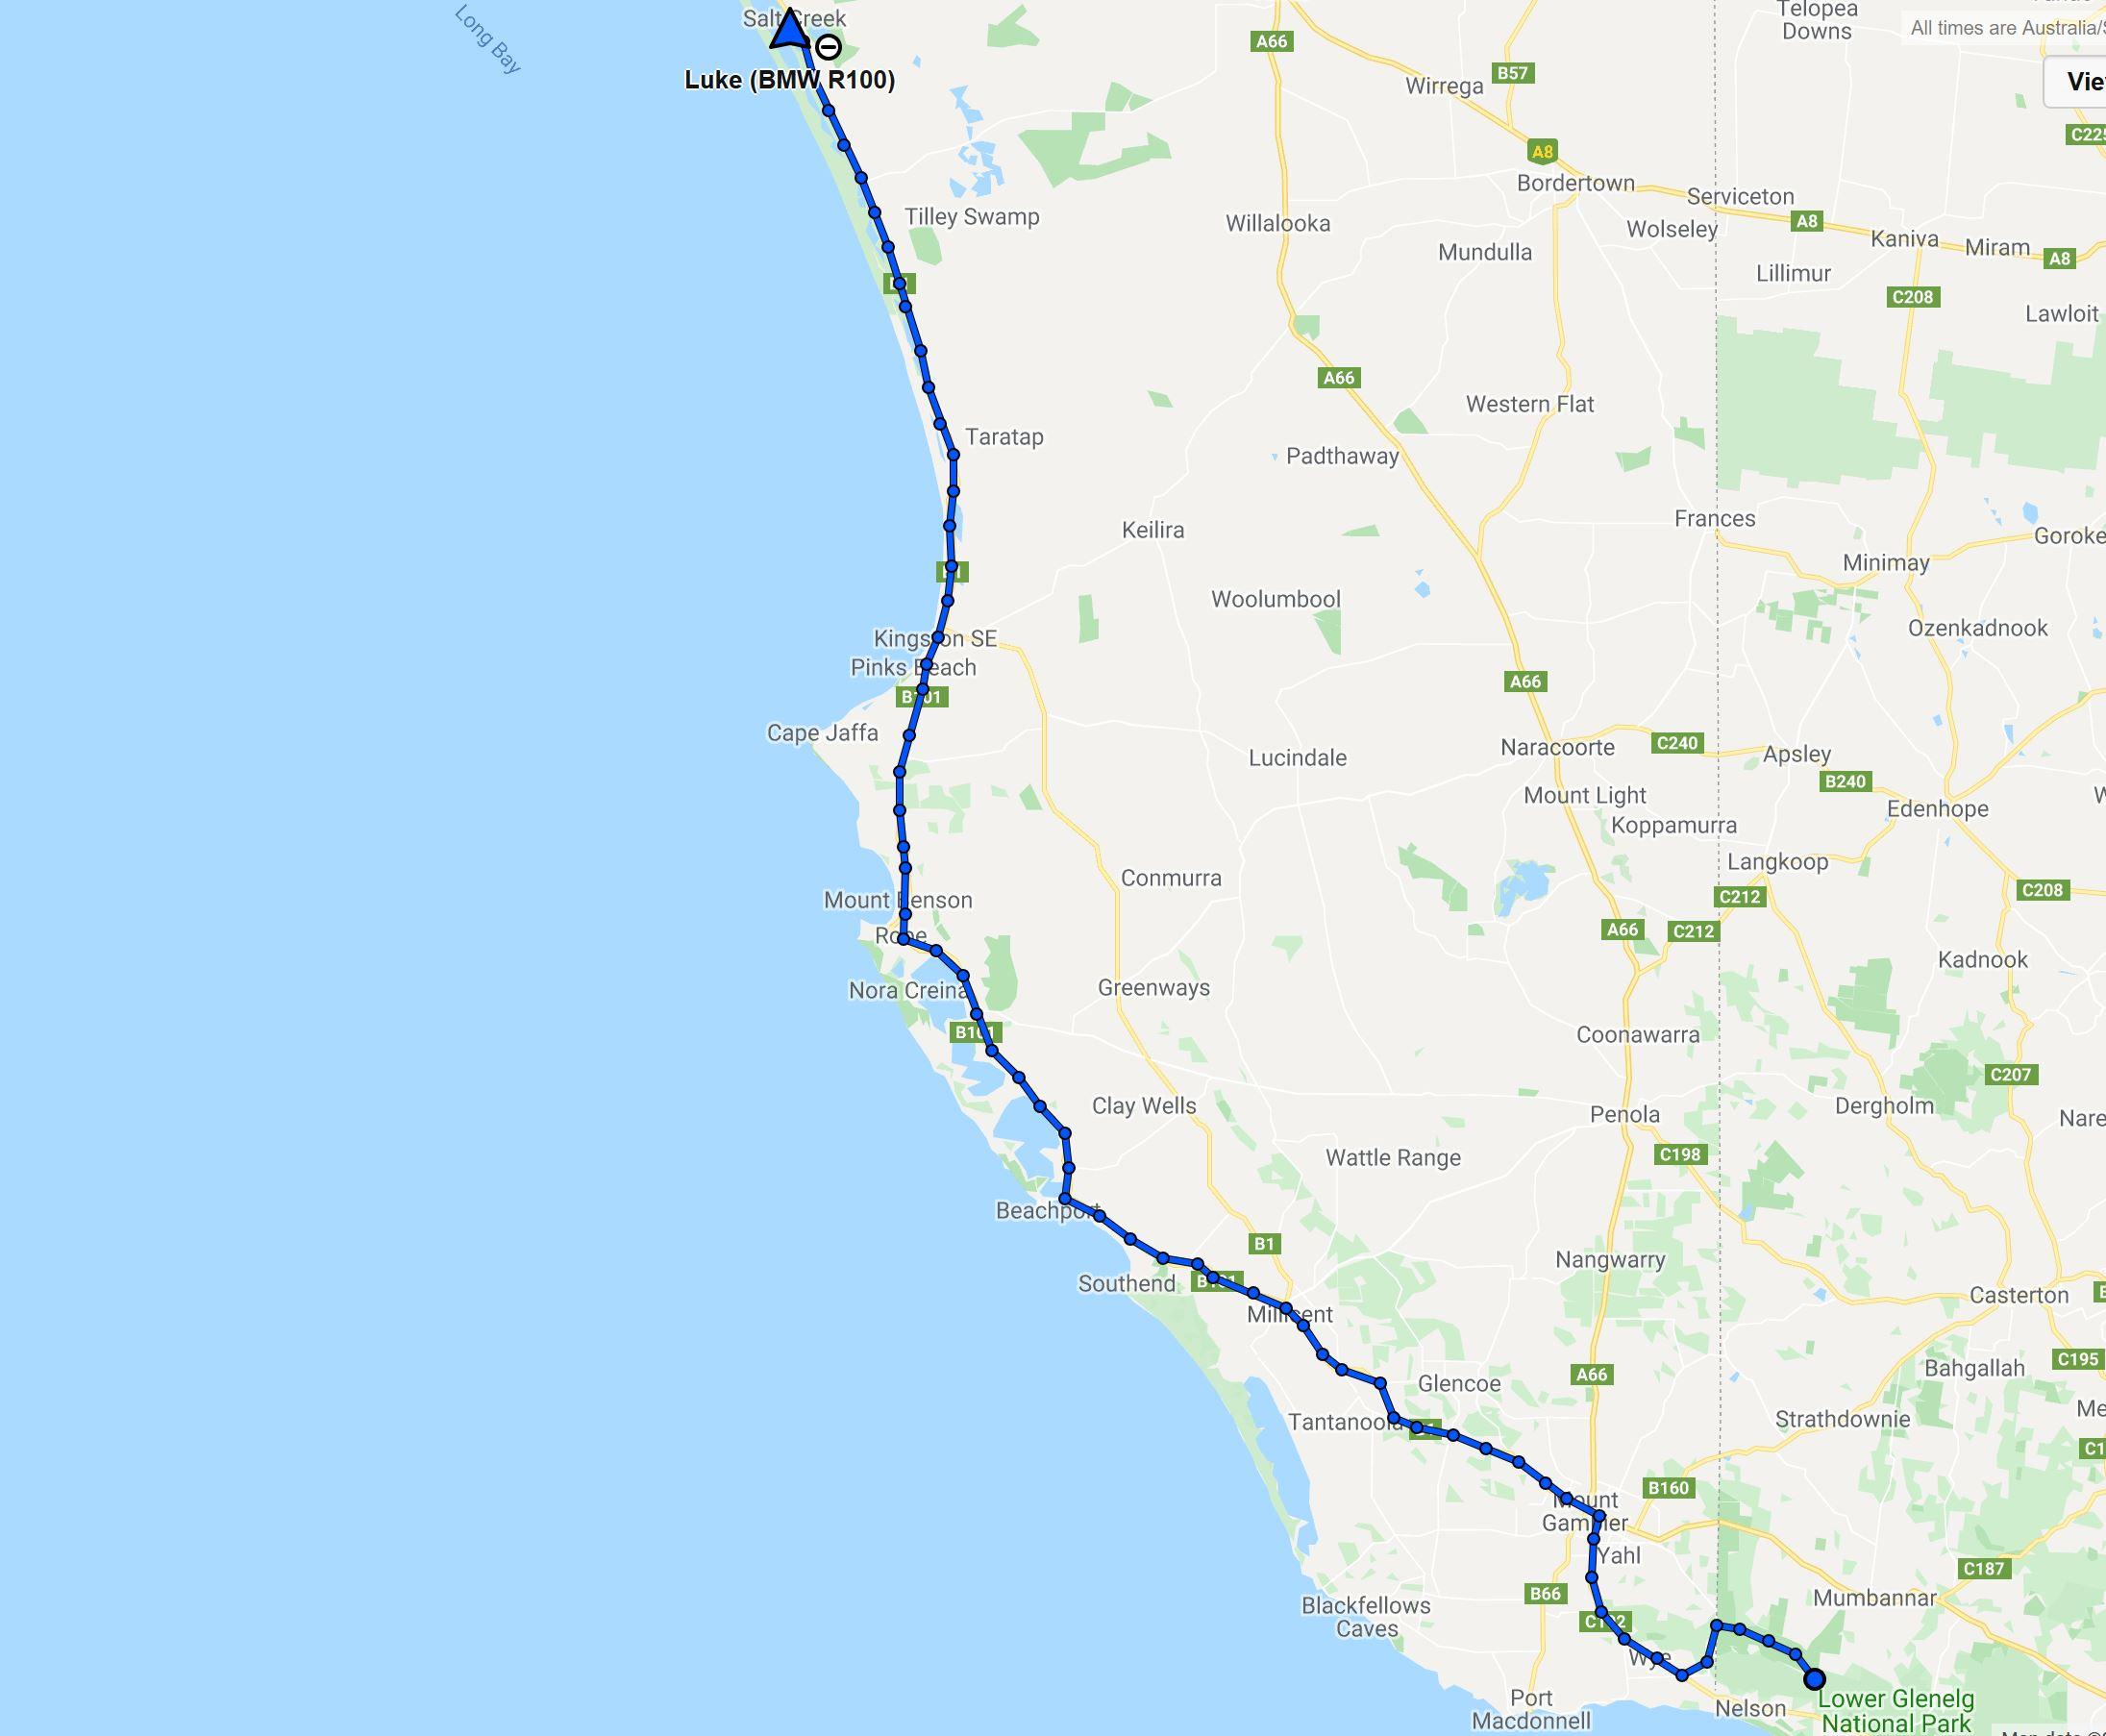 Perth Trip – Day 16 – 2019/12/18